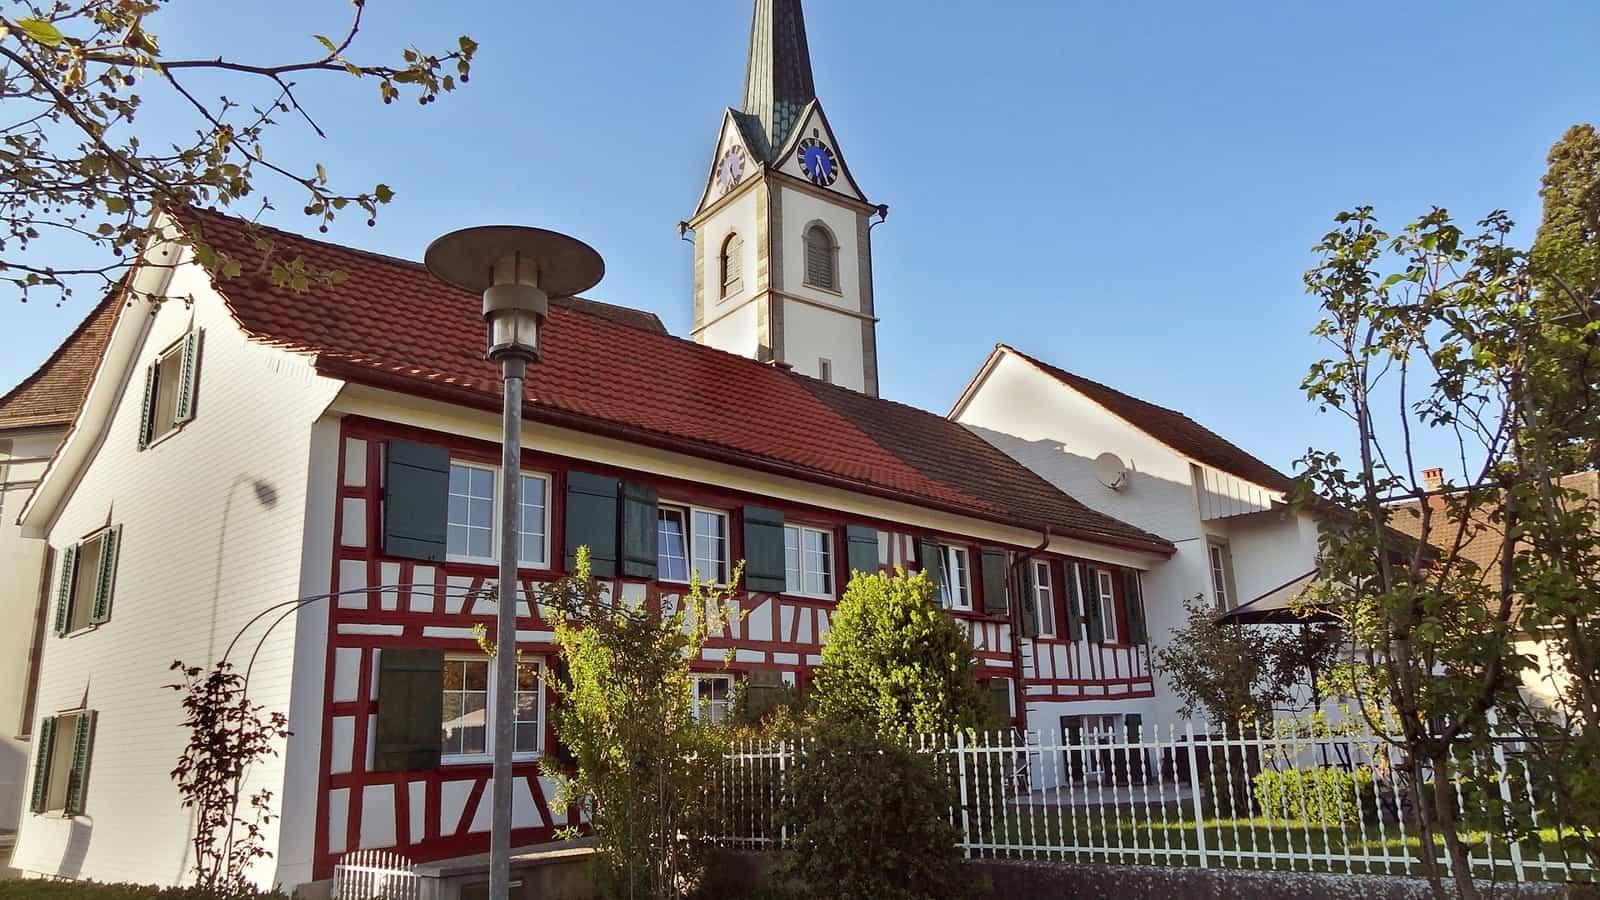 Oberdorf Altnau